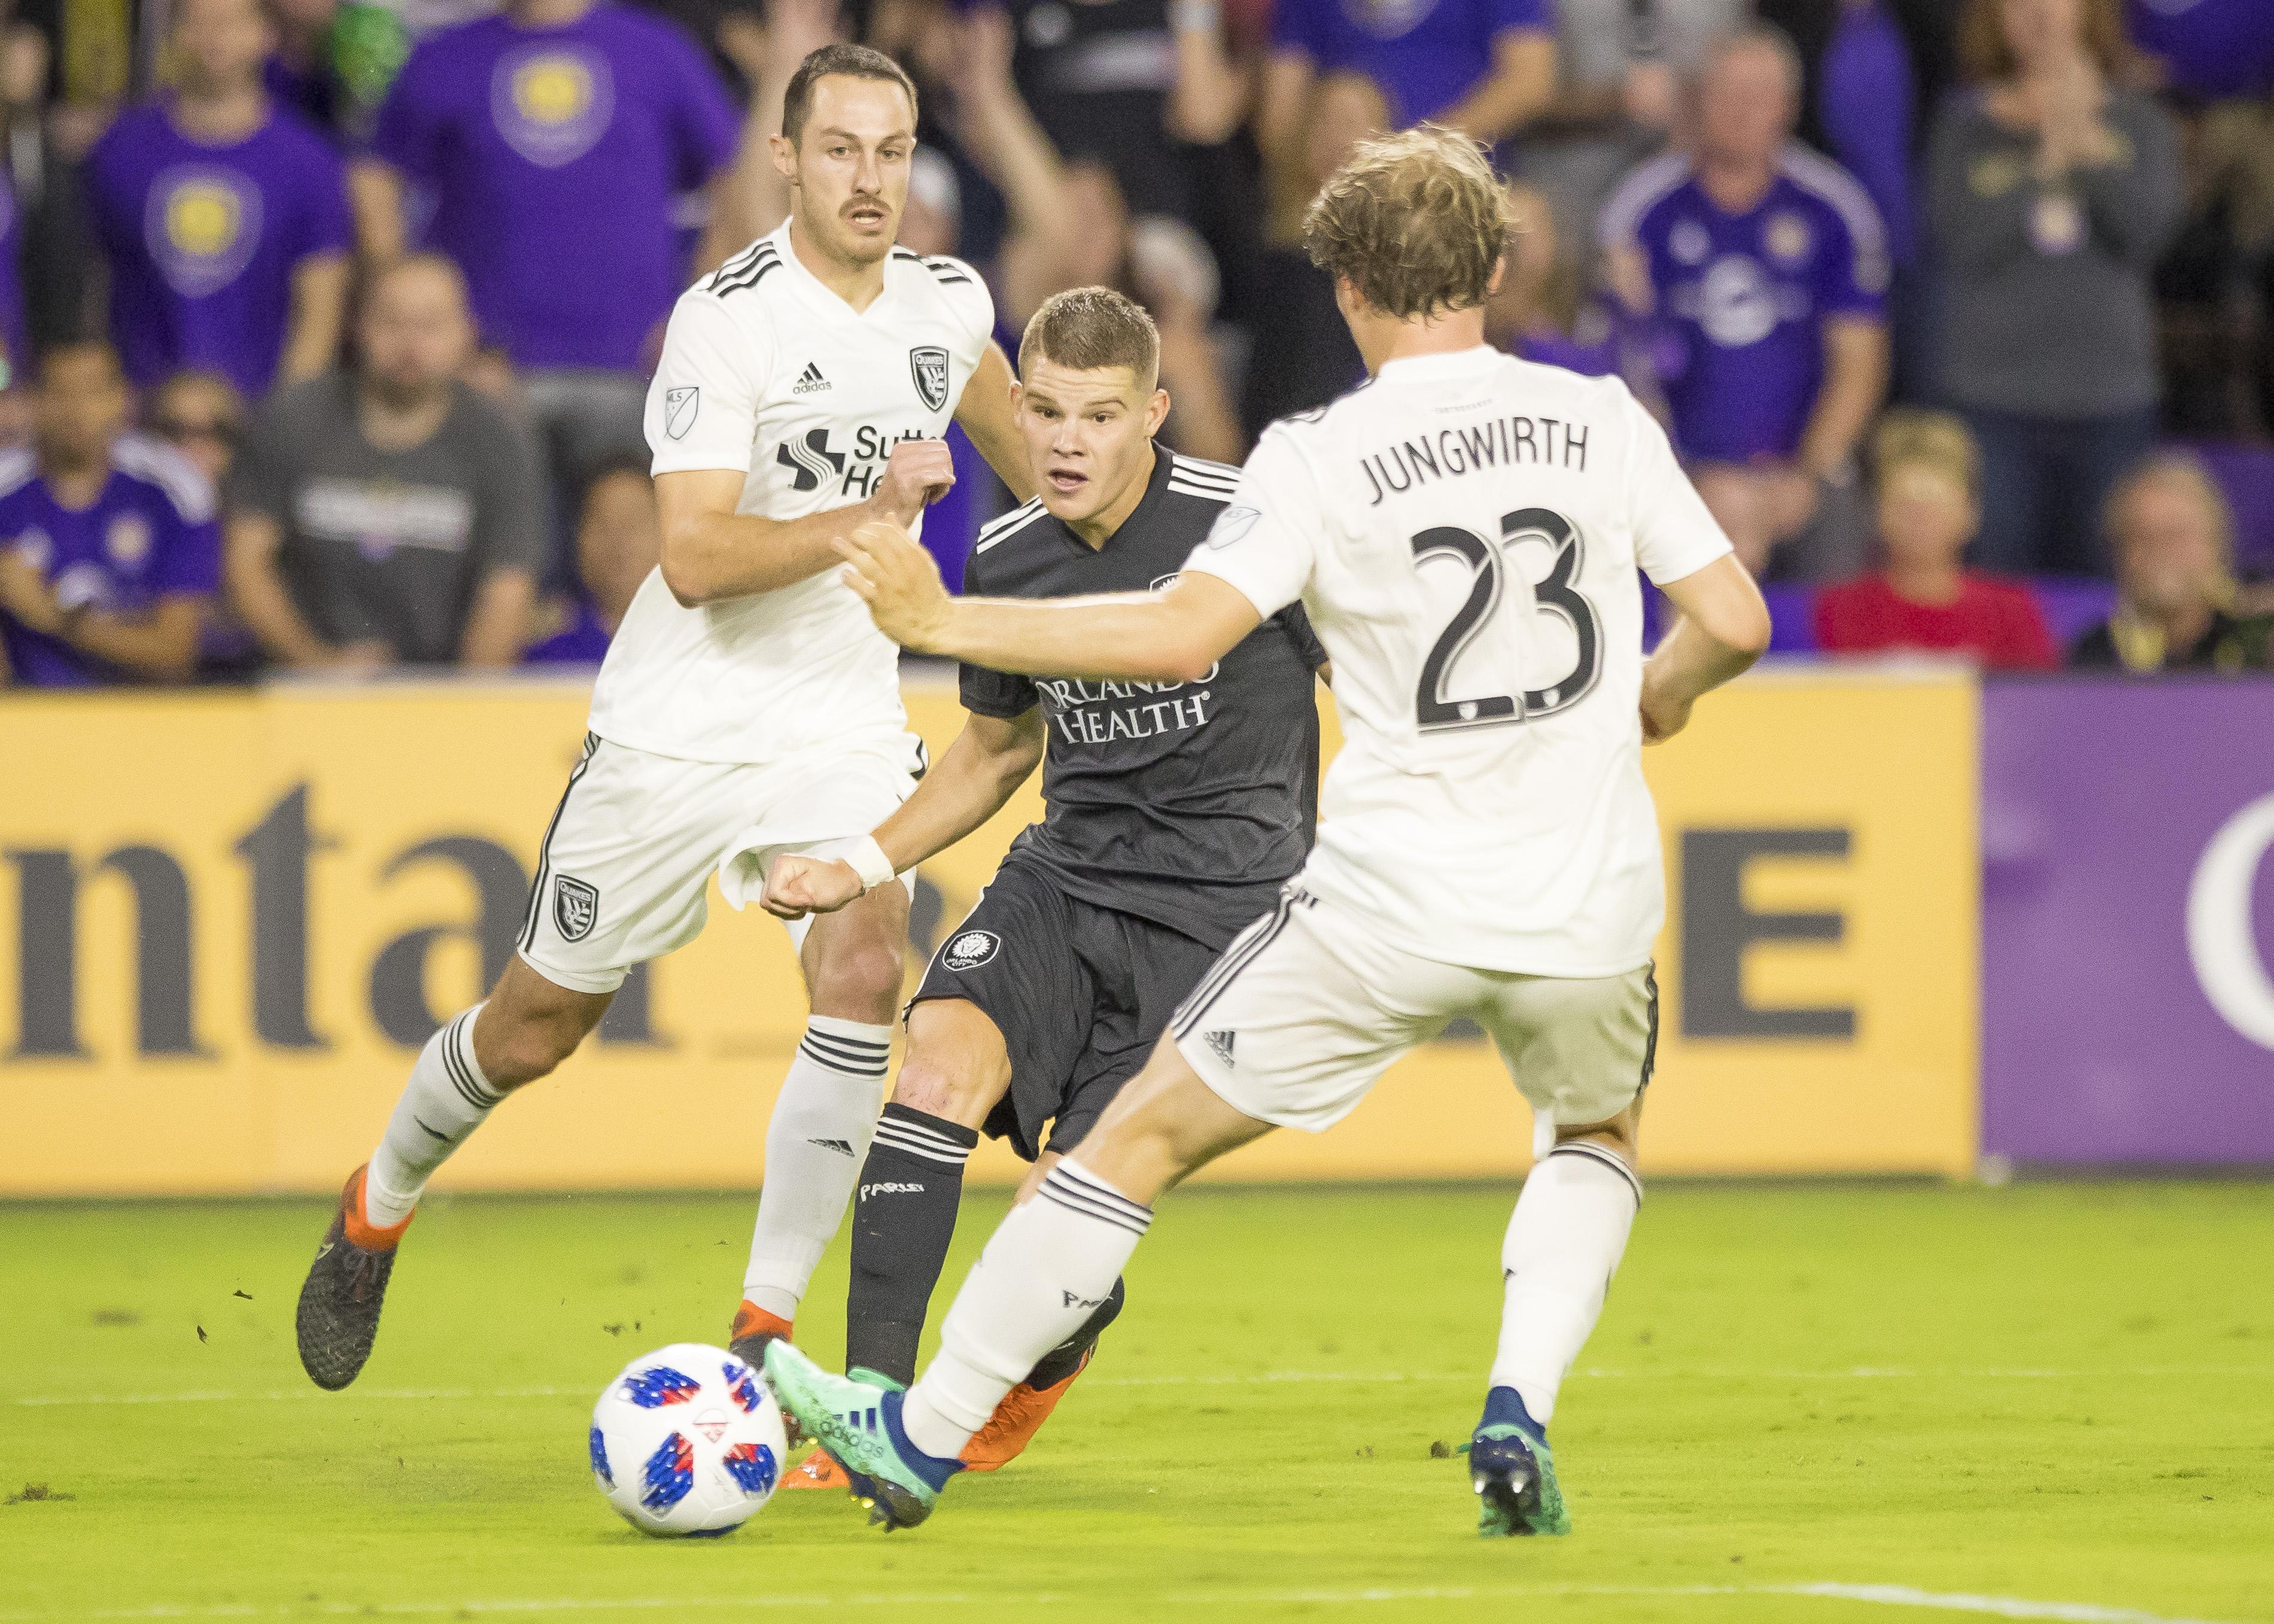 SOCCER: APR 21 MLS - San Jose Earthquakes at Orlando City SC